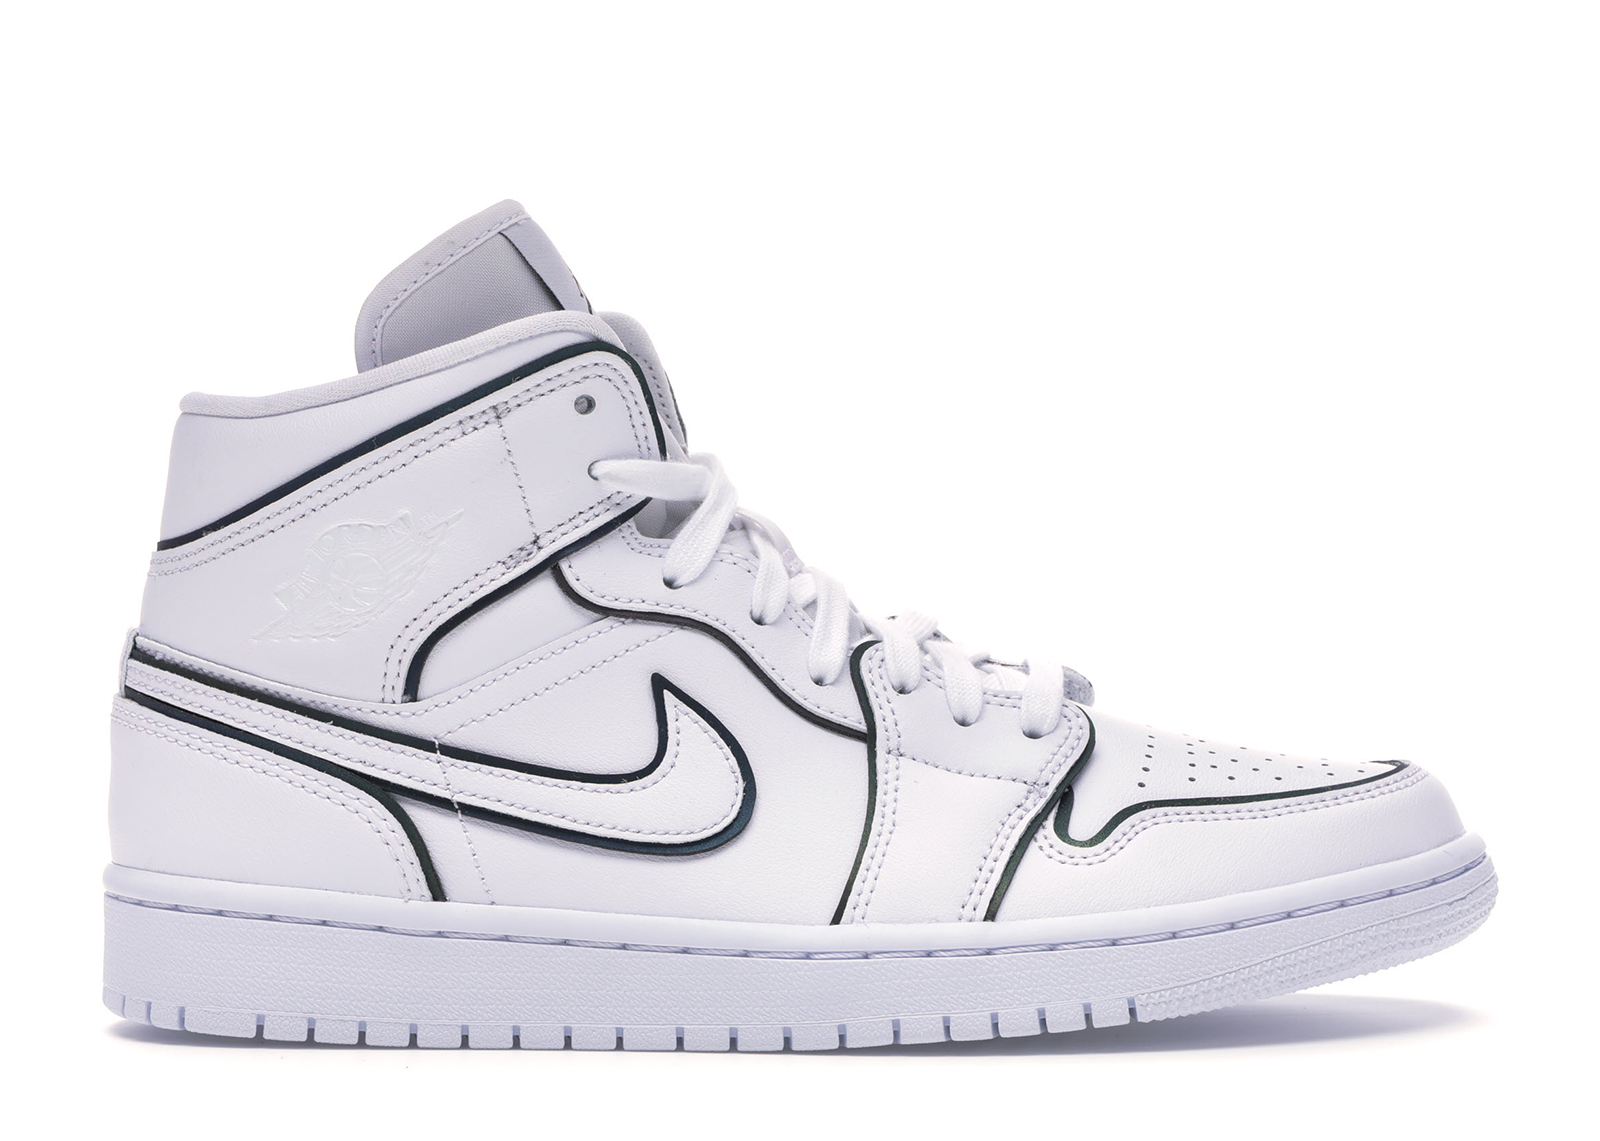 Jordan 1 Mid Iridescent Reflective White (W)